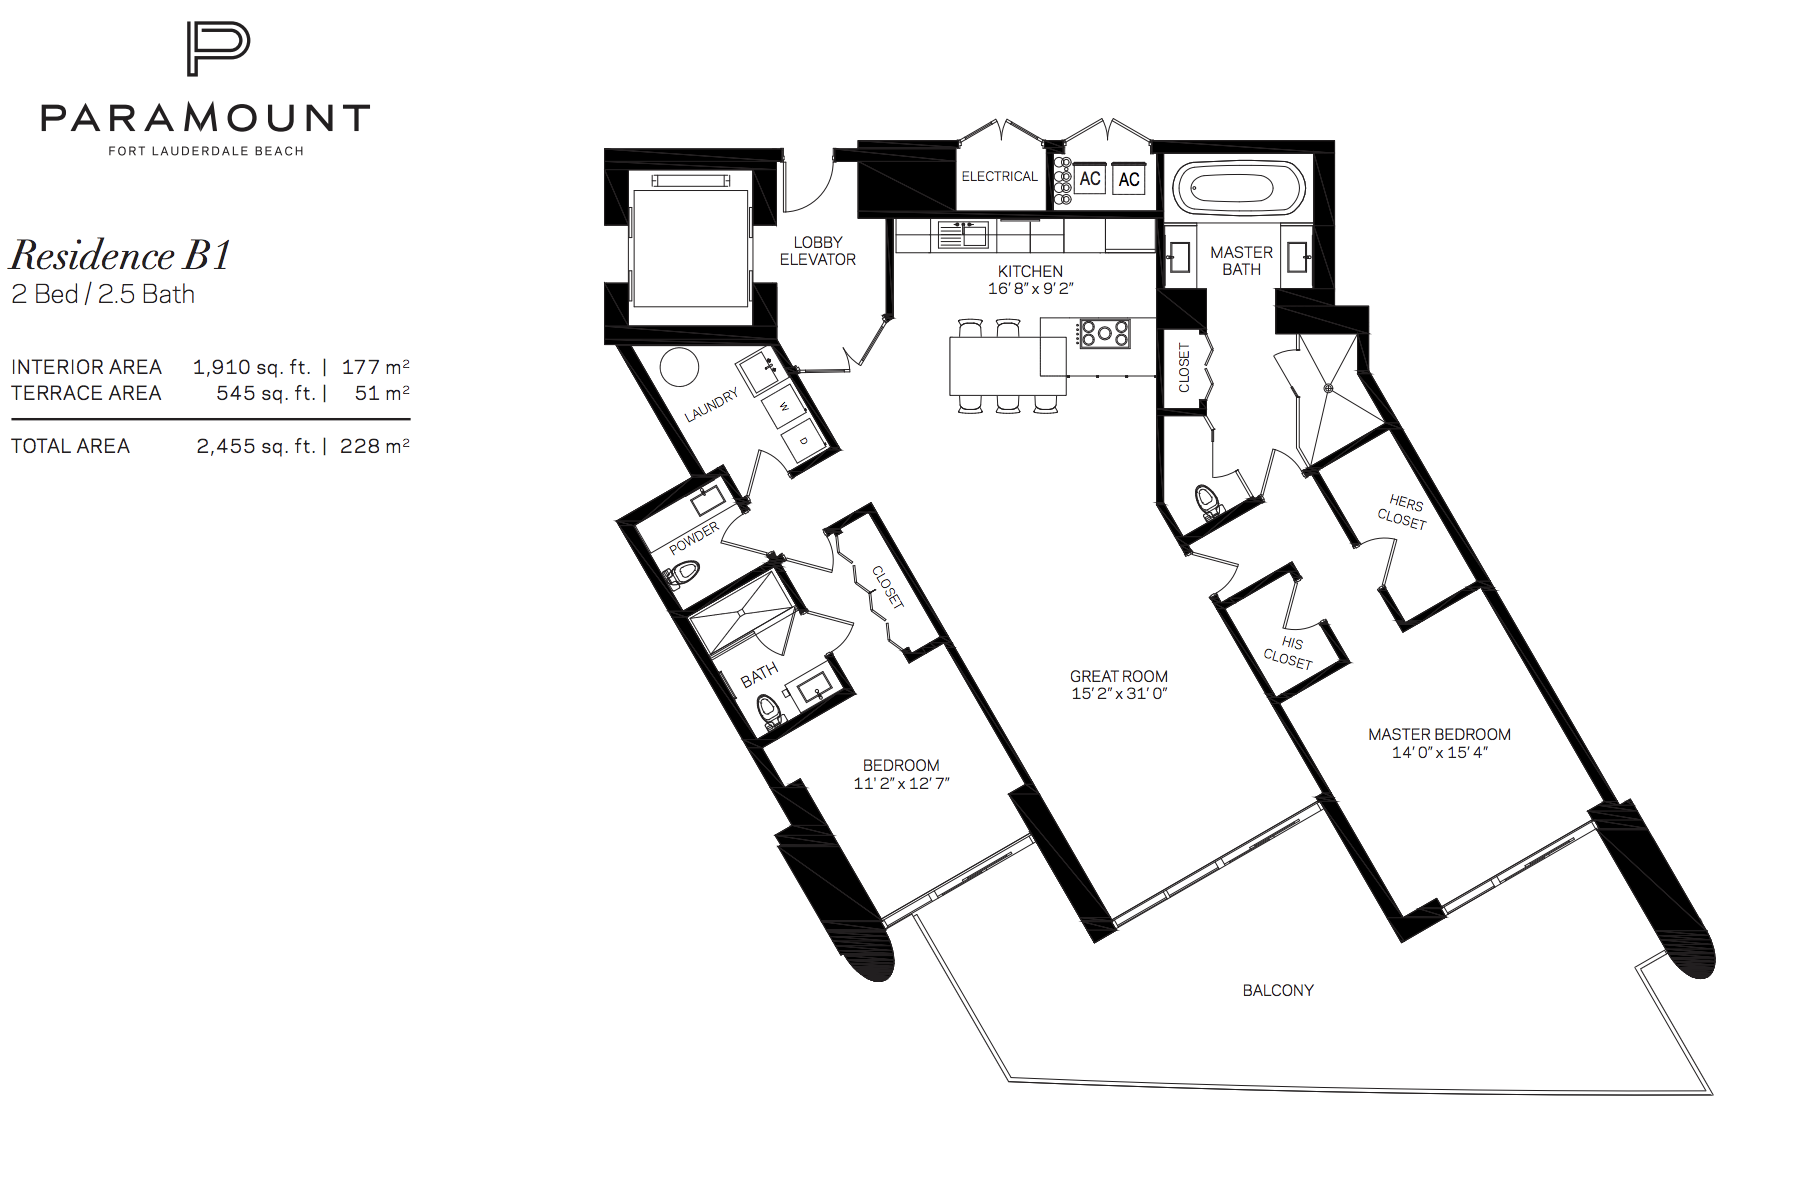 Paramount Residences Fort lauderdale Unit B1   2 Beds - 2.5 Baths